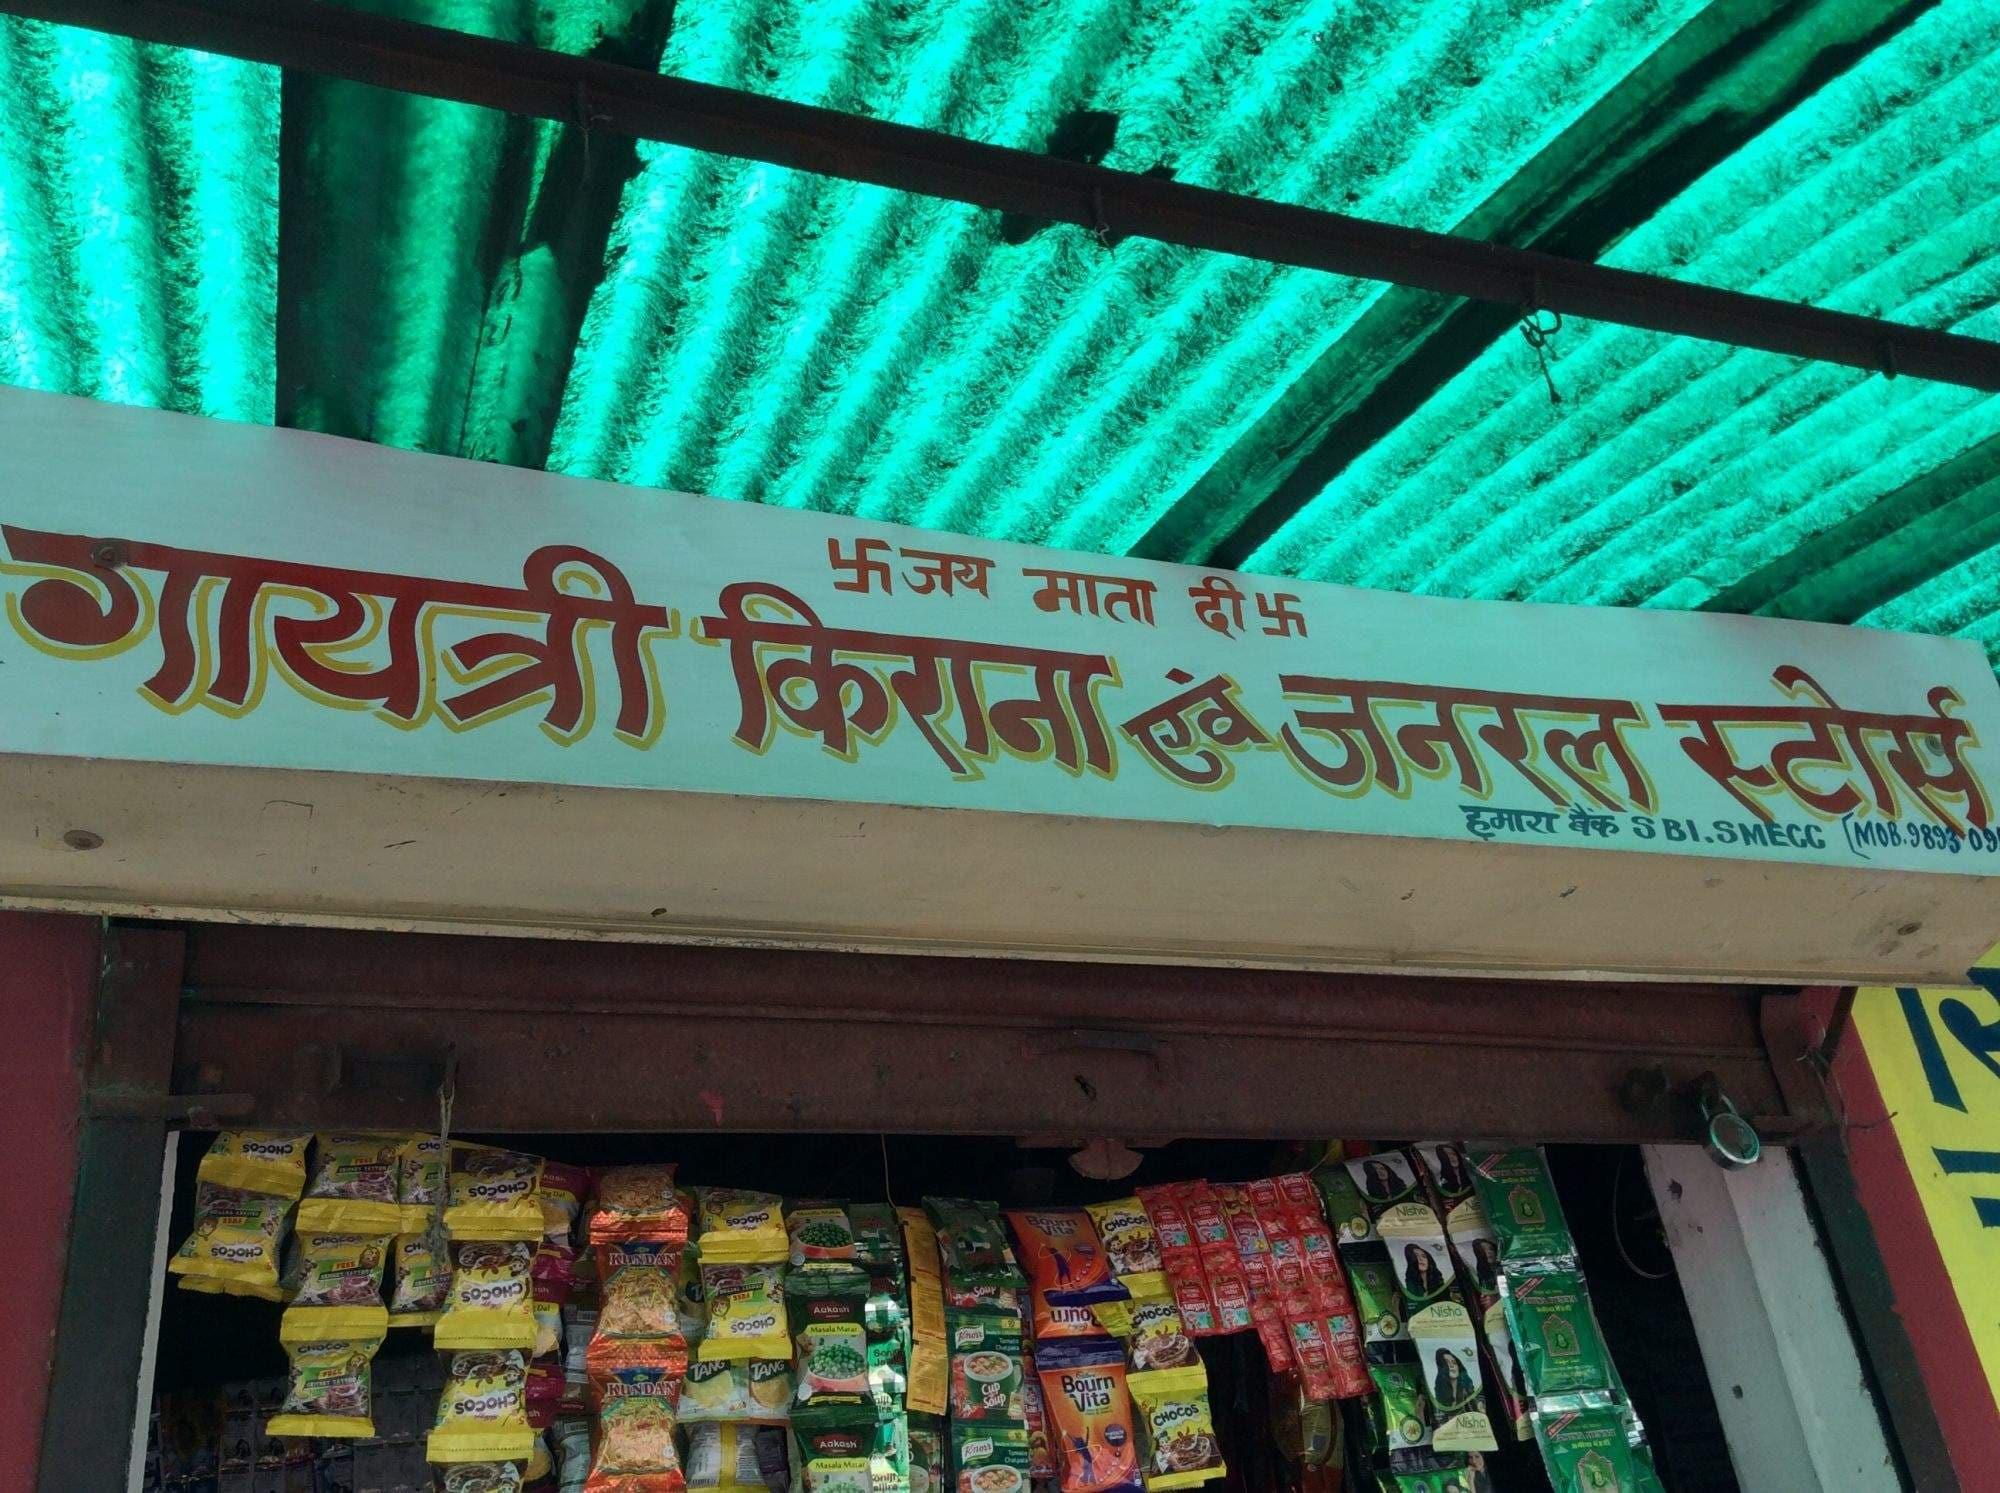 Top Salt Distributors in M P Nagar, Bhopal - Justdial